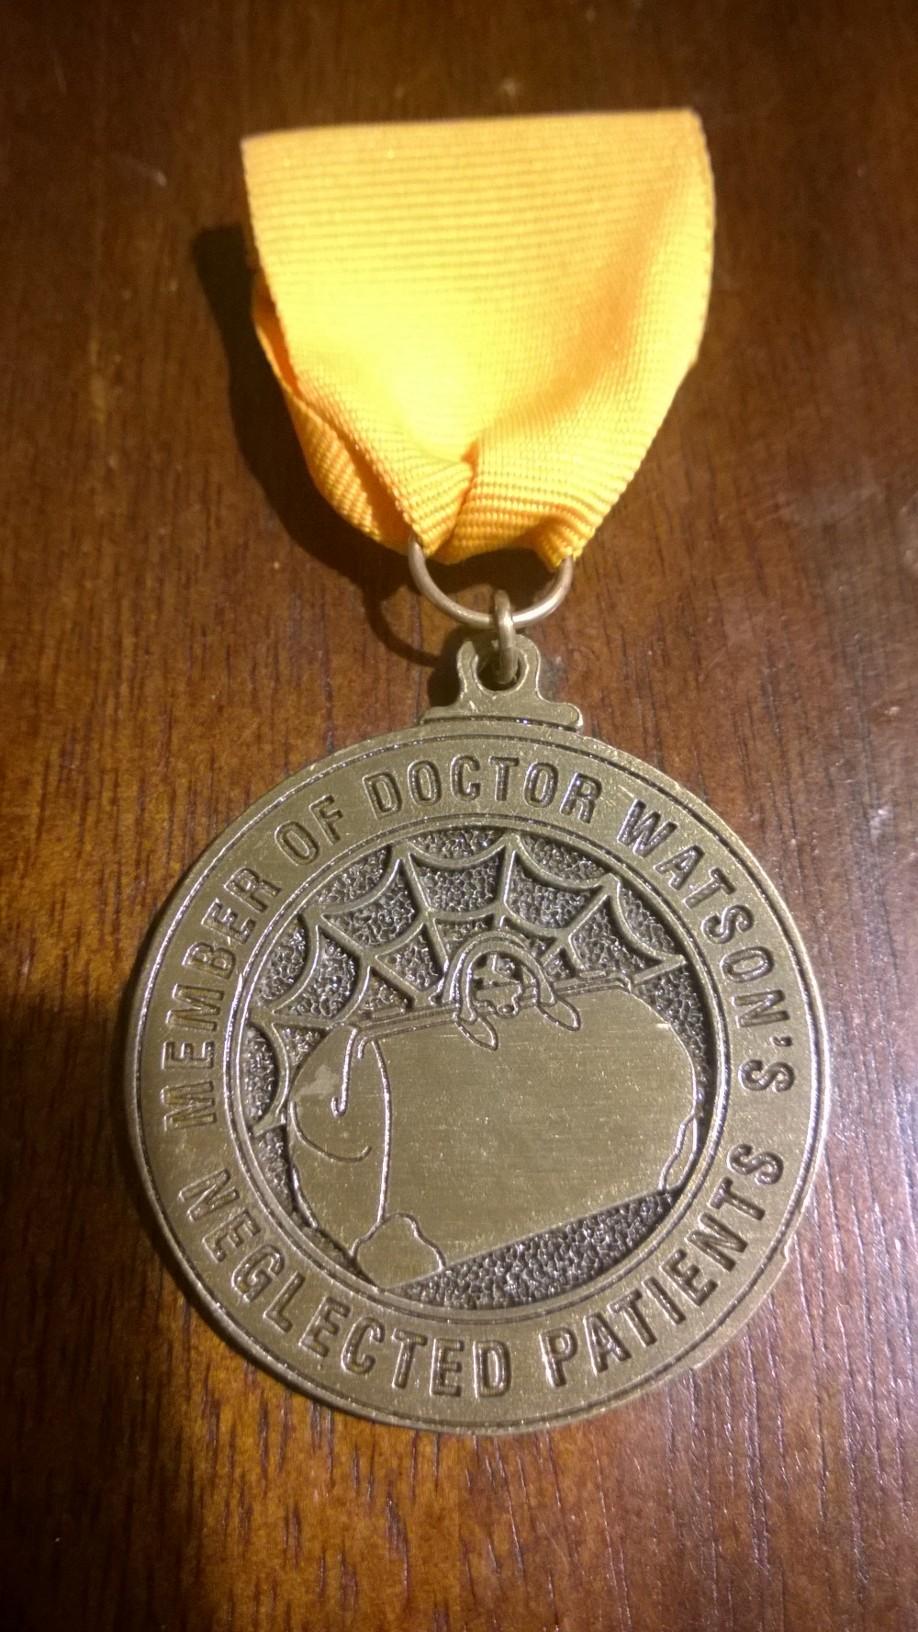 The Member's Badge of Denver's Doctor Watson's Neglected Patients